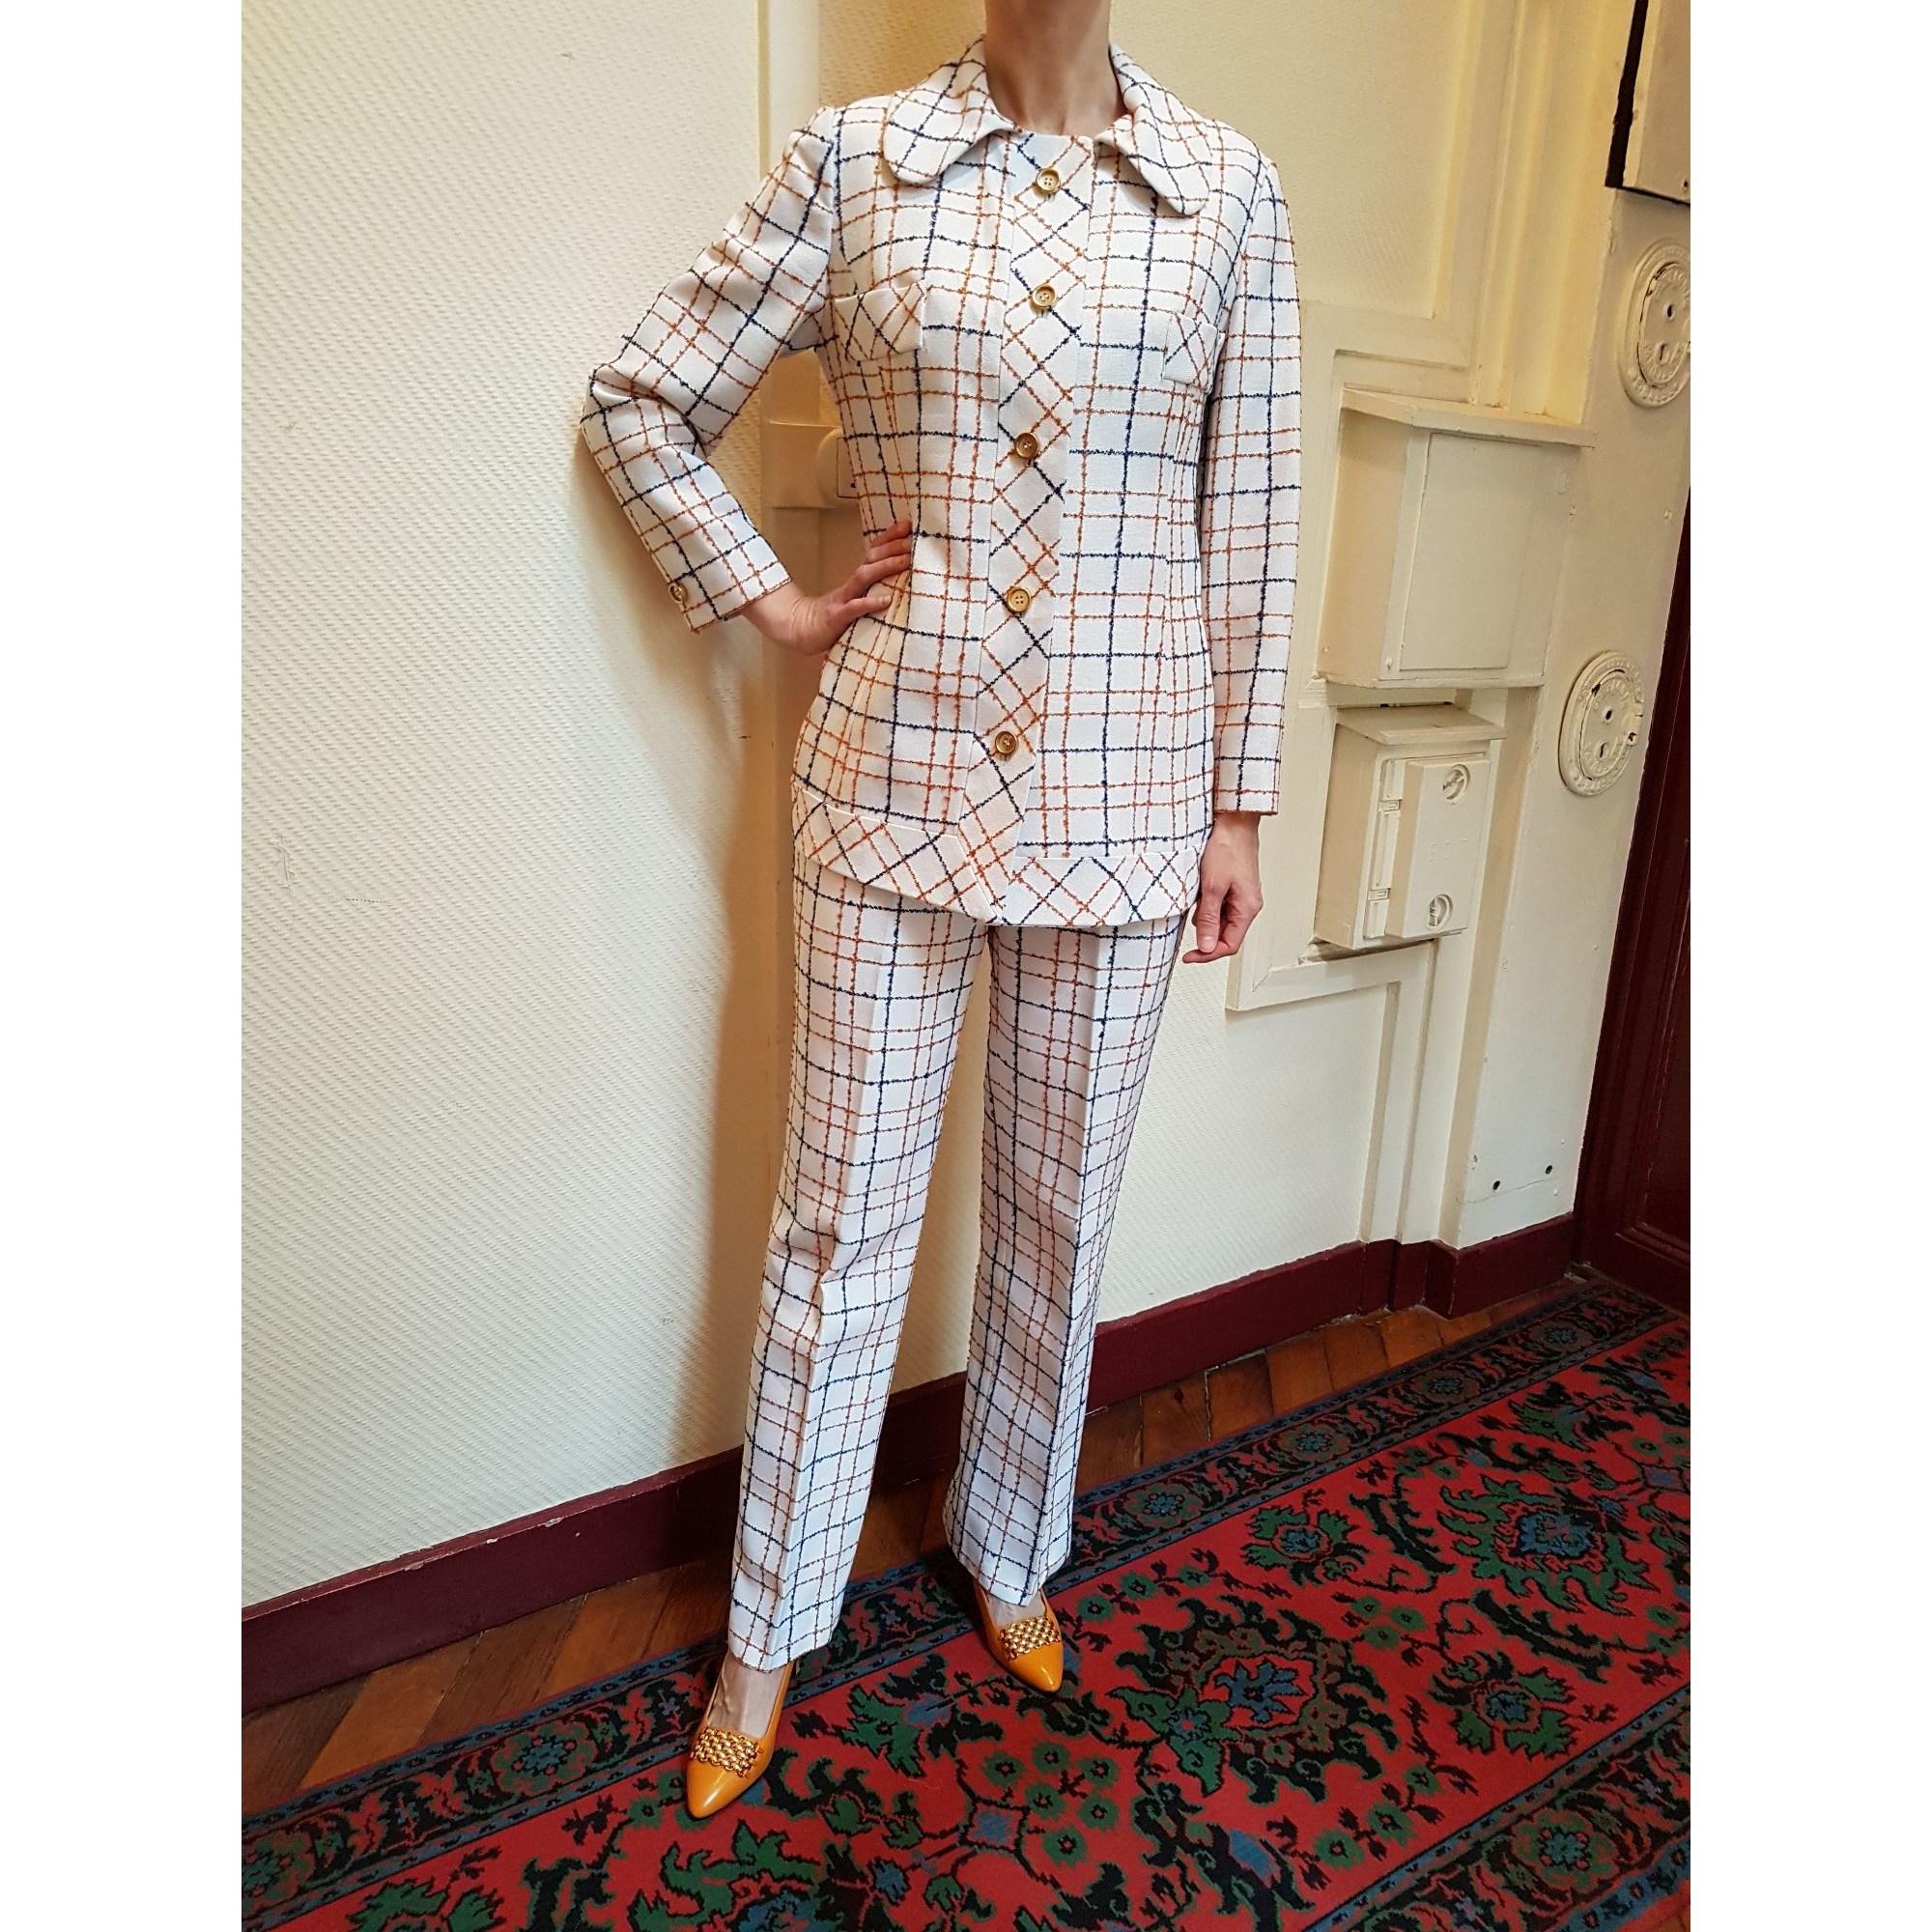 Tailleur pantalon TAILORED BY KIRKLAND HALL U.S.A Blanc, blanc cassé, écru